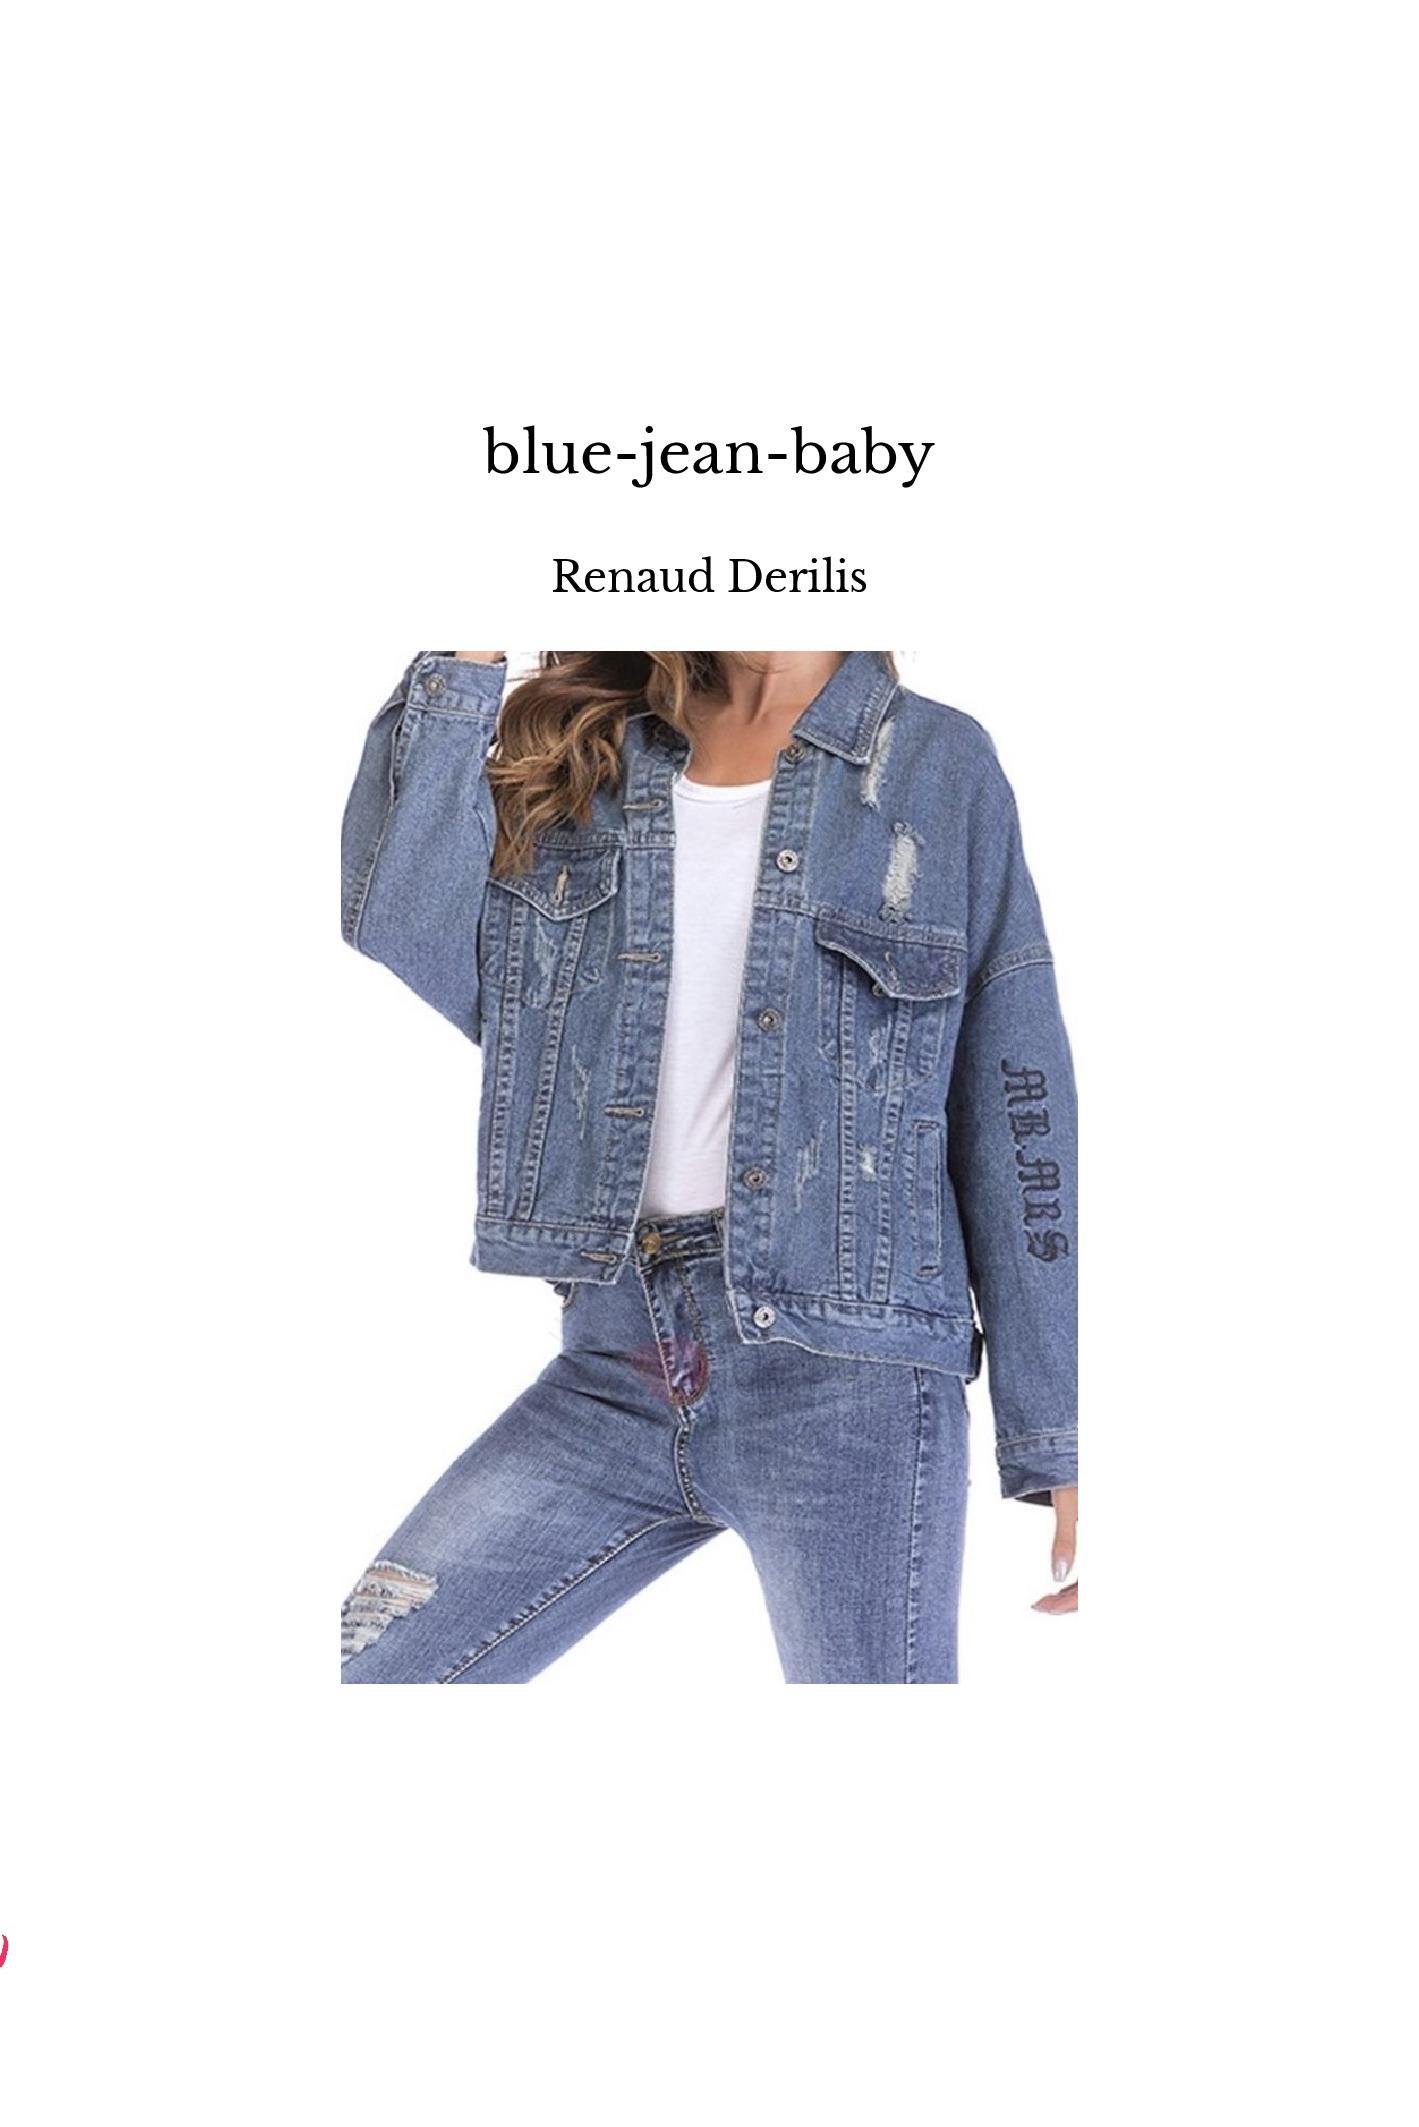 blue-jean-baby